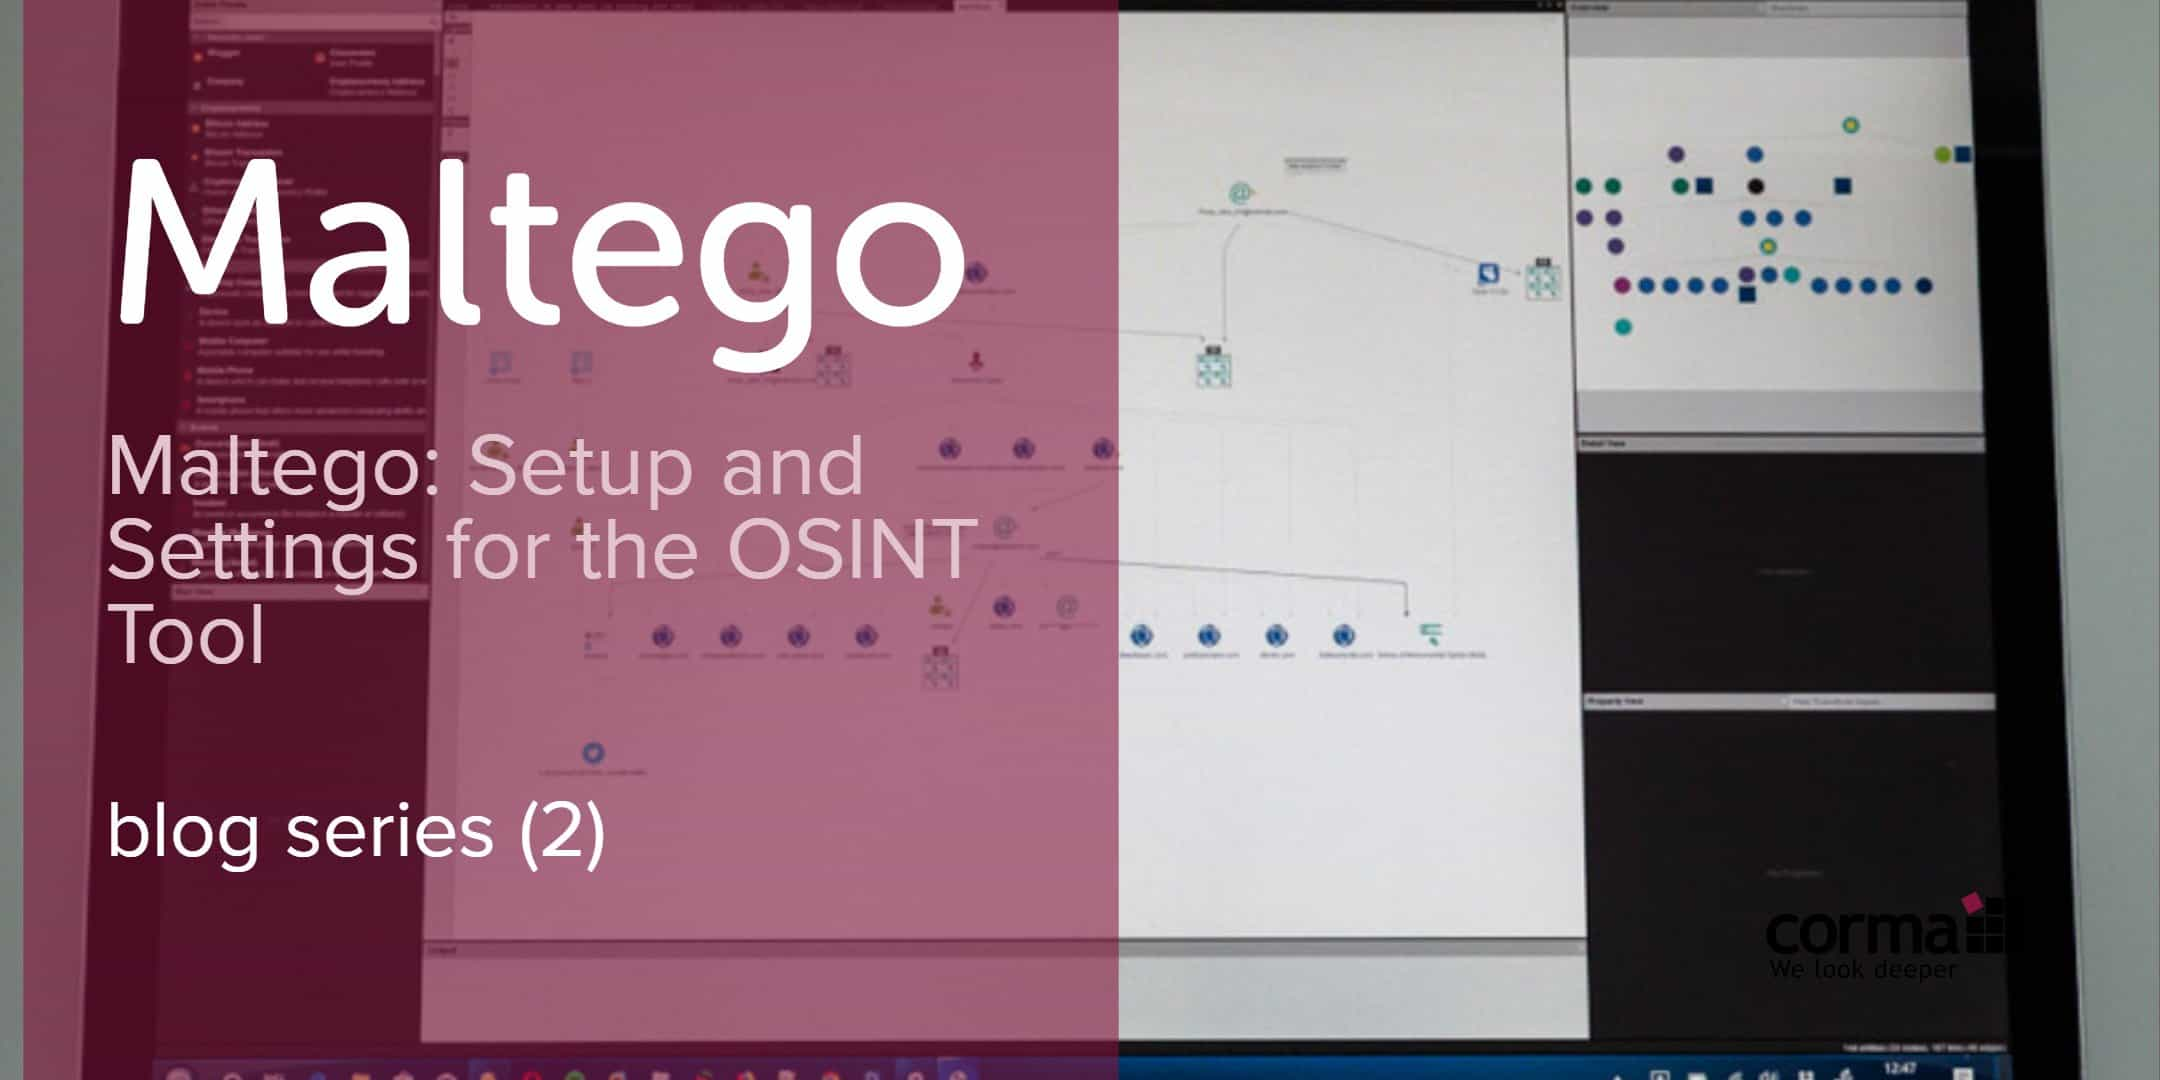 Series (2): Maltego Setup and Settings for the OSINT Tool